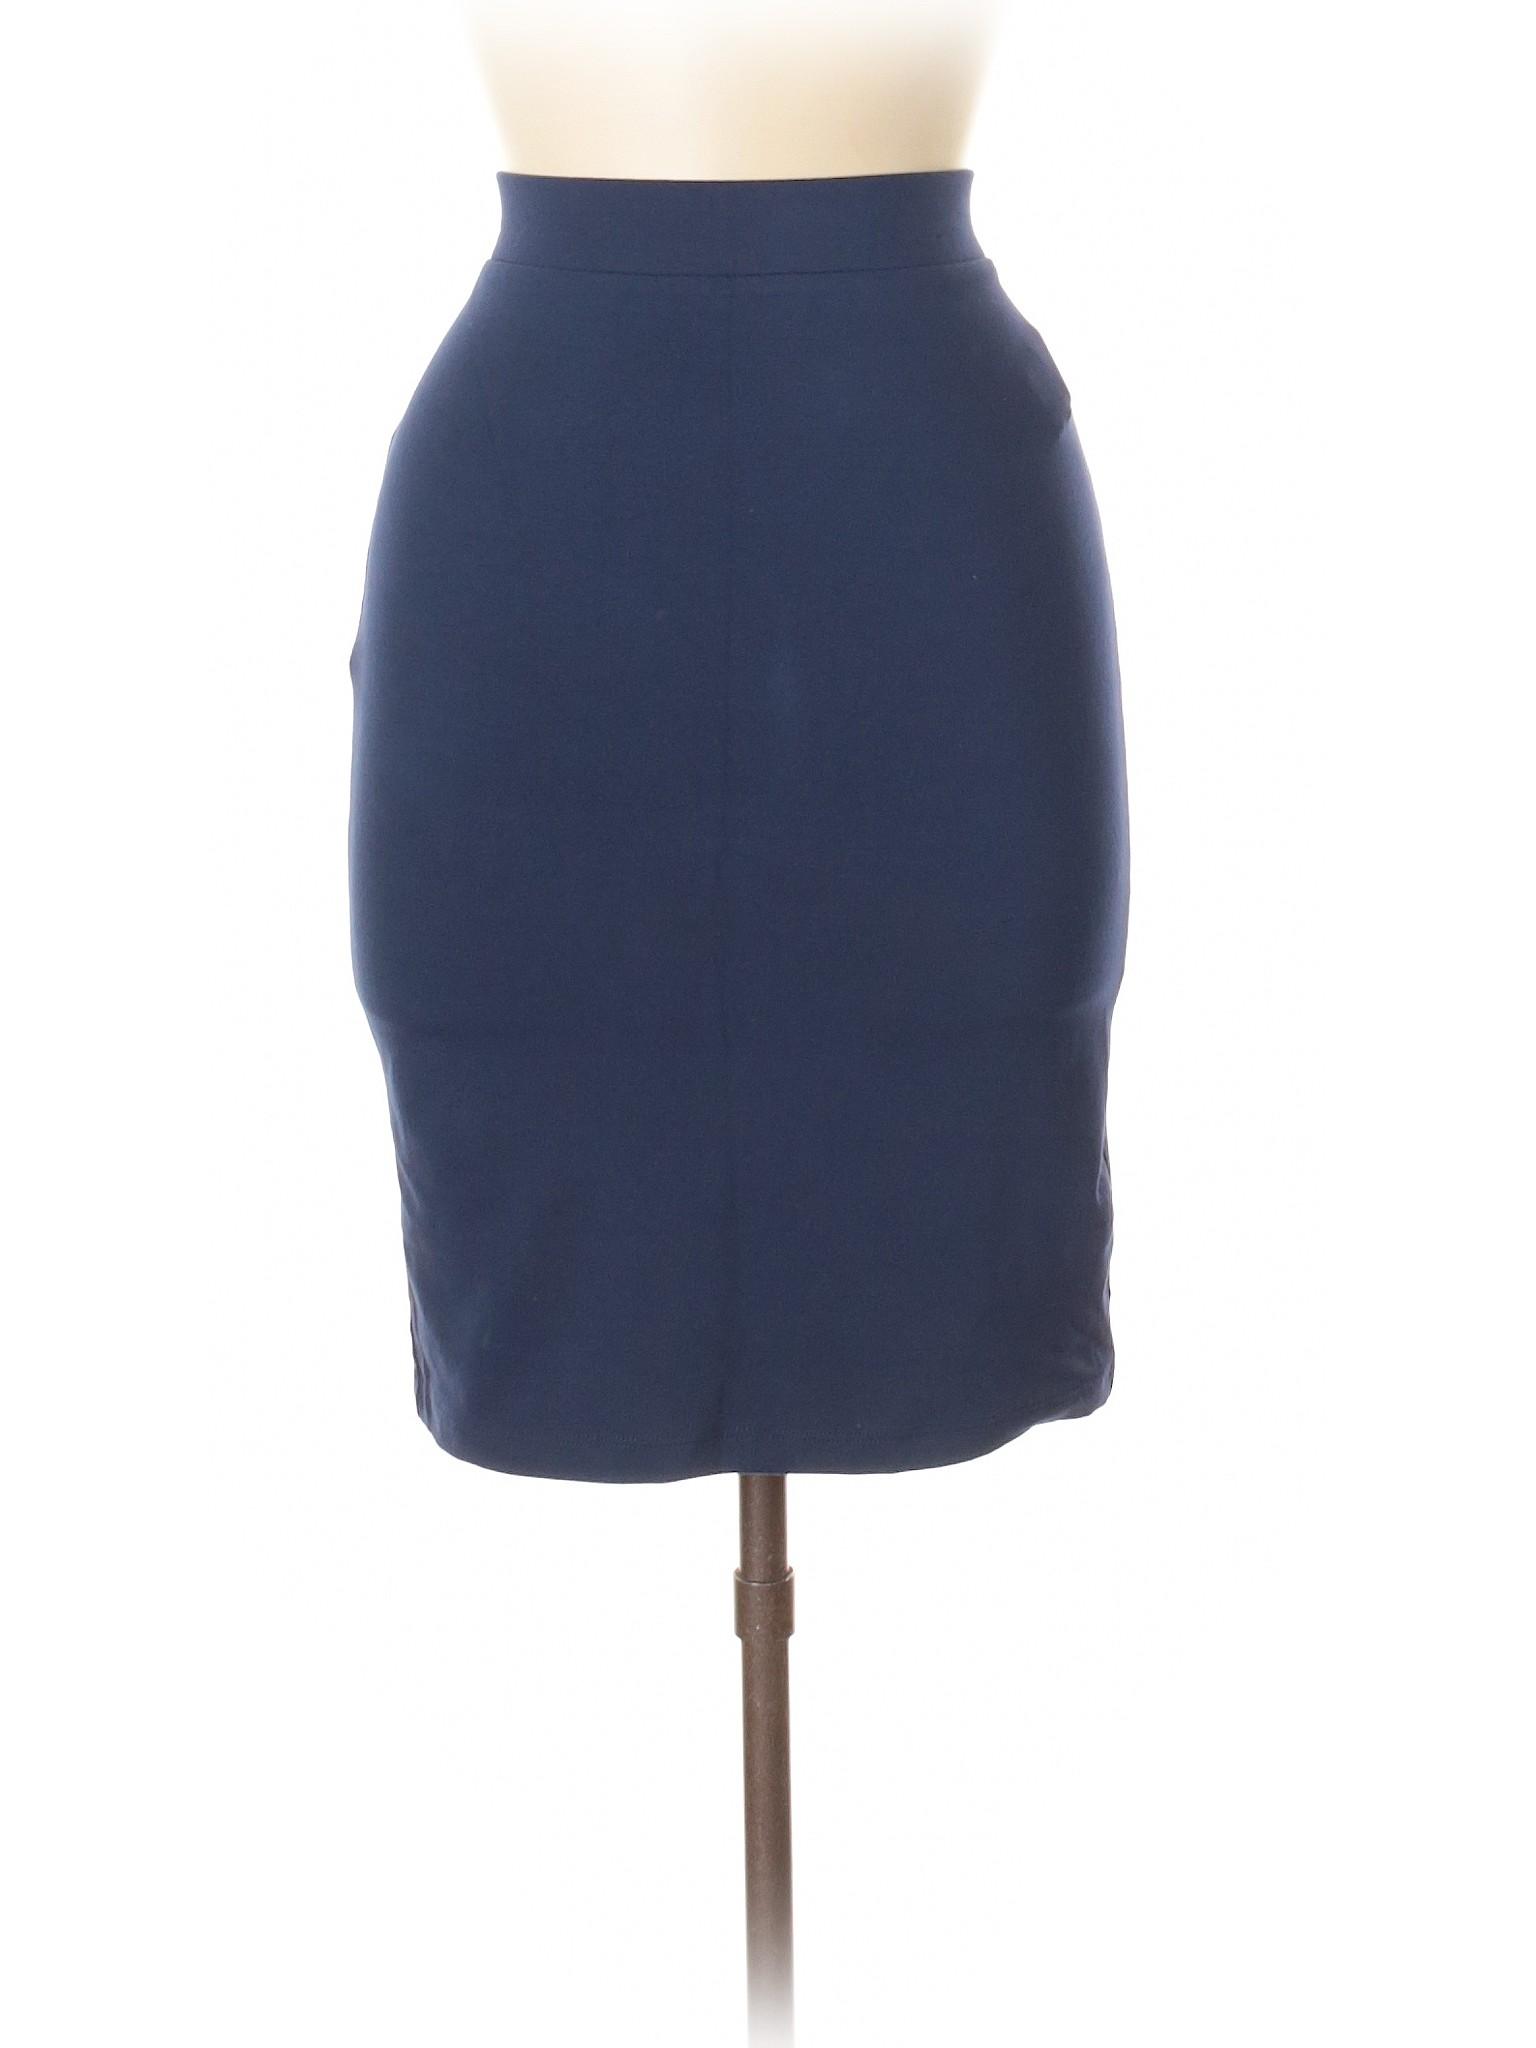 winter Skirt Forever 21 Leisure Casual FYq4g4C